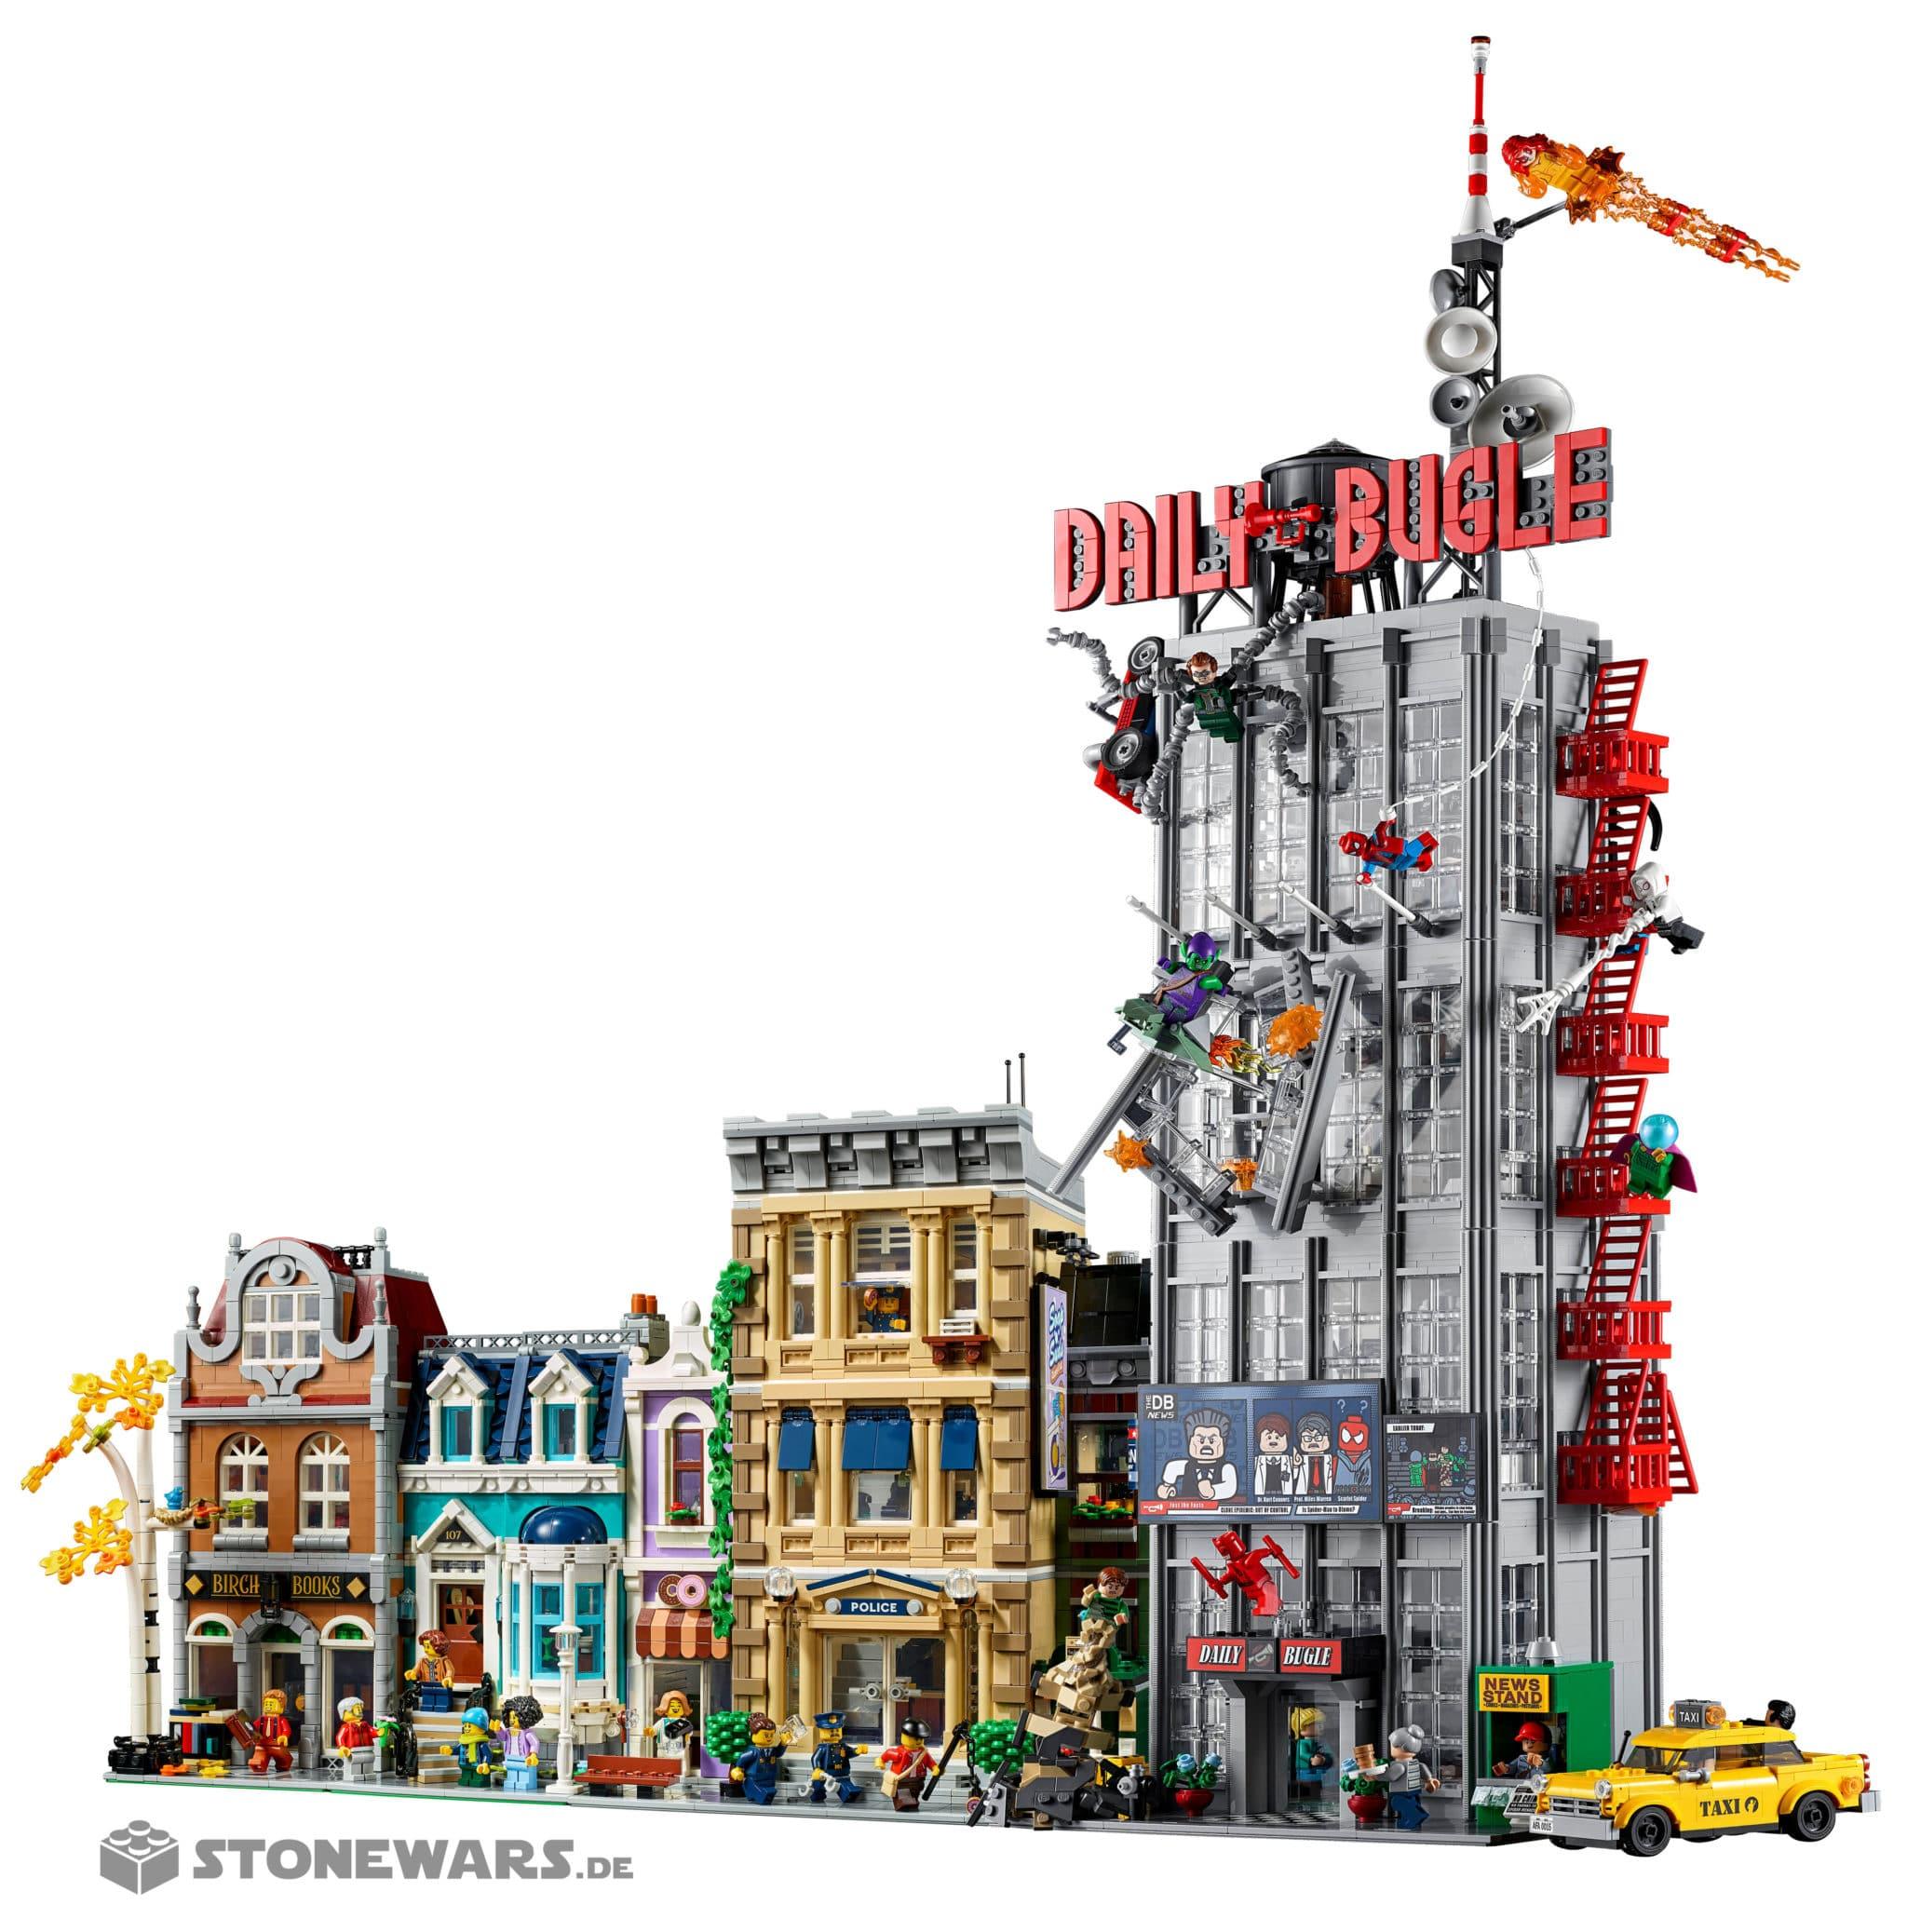 LEGO Marvel 76178 Daily Bugle Modular Building